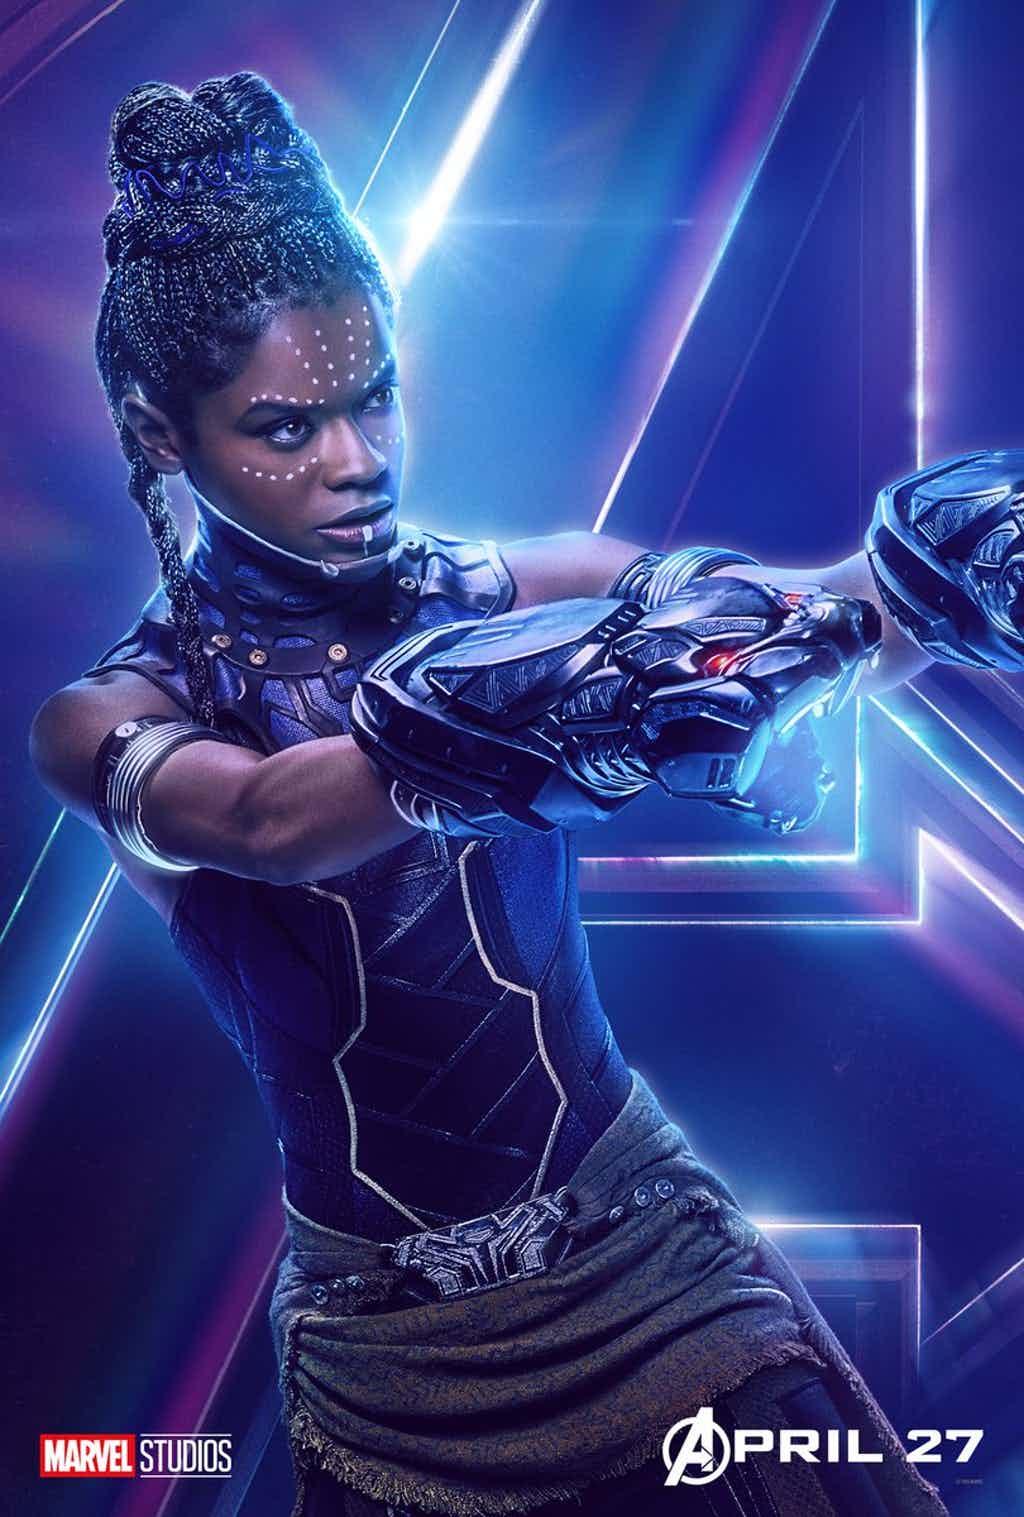 szmk_marvel_infinity_war_vegtelen_haboru_bosszuallok_avengers_ironman_hulk_thor_captainamaerica_guardians_galaxy_15.jpg